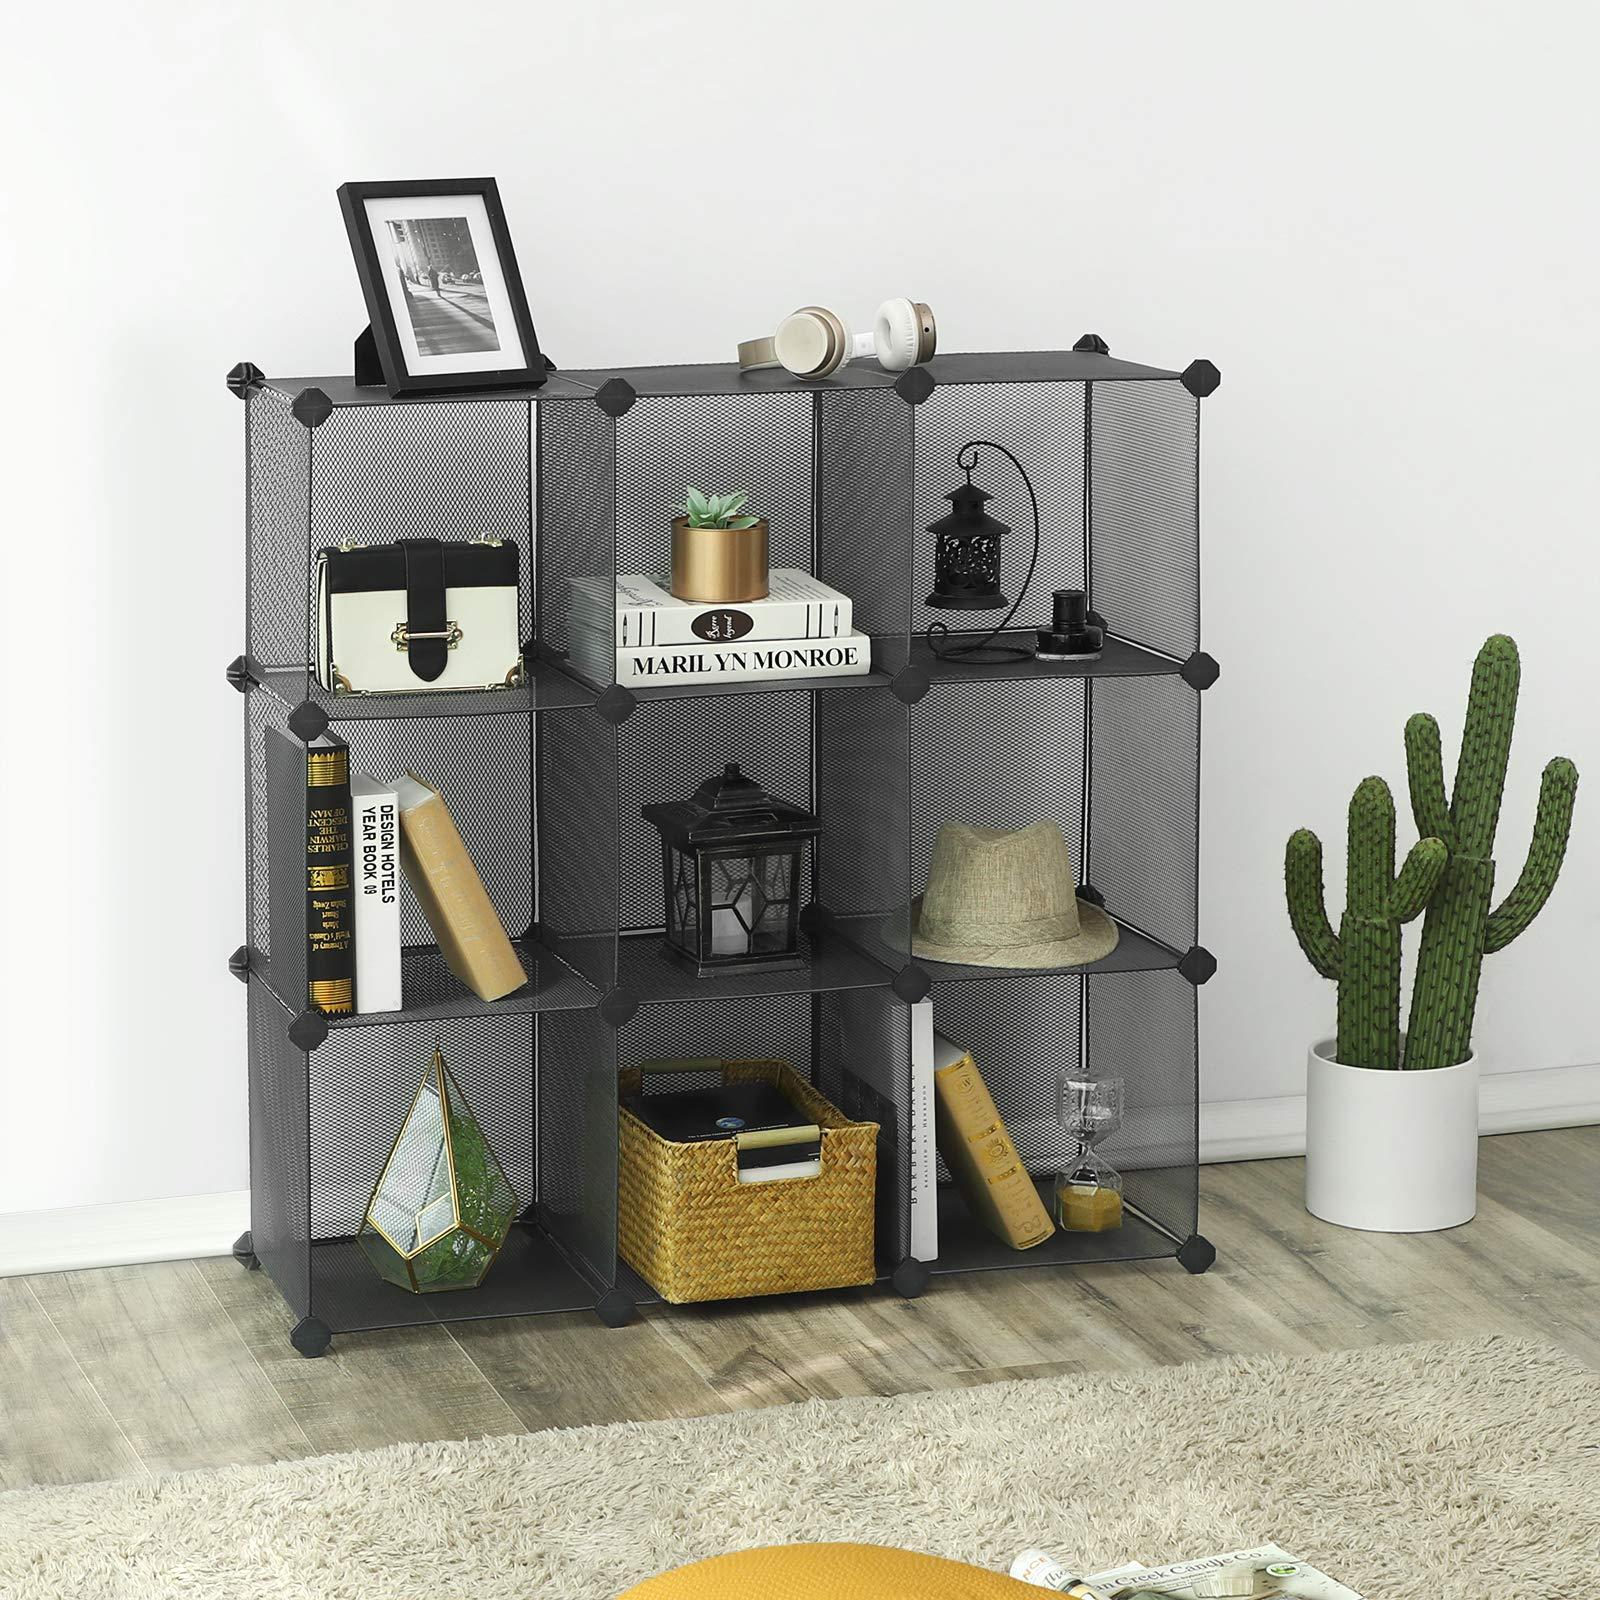 SONGMICS 9-Cube Metal Mesh Storage Cube, Book Shelf, Modular Bookcase, DIY Closet Cabinet Organizer for Books, Plants, Toys, Shoes, Clothes 36.6''L x 12.2''W x 48.4''H, Gray ULPL115G by SONGMICS (Image #2)